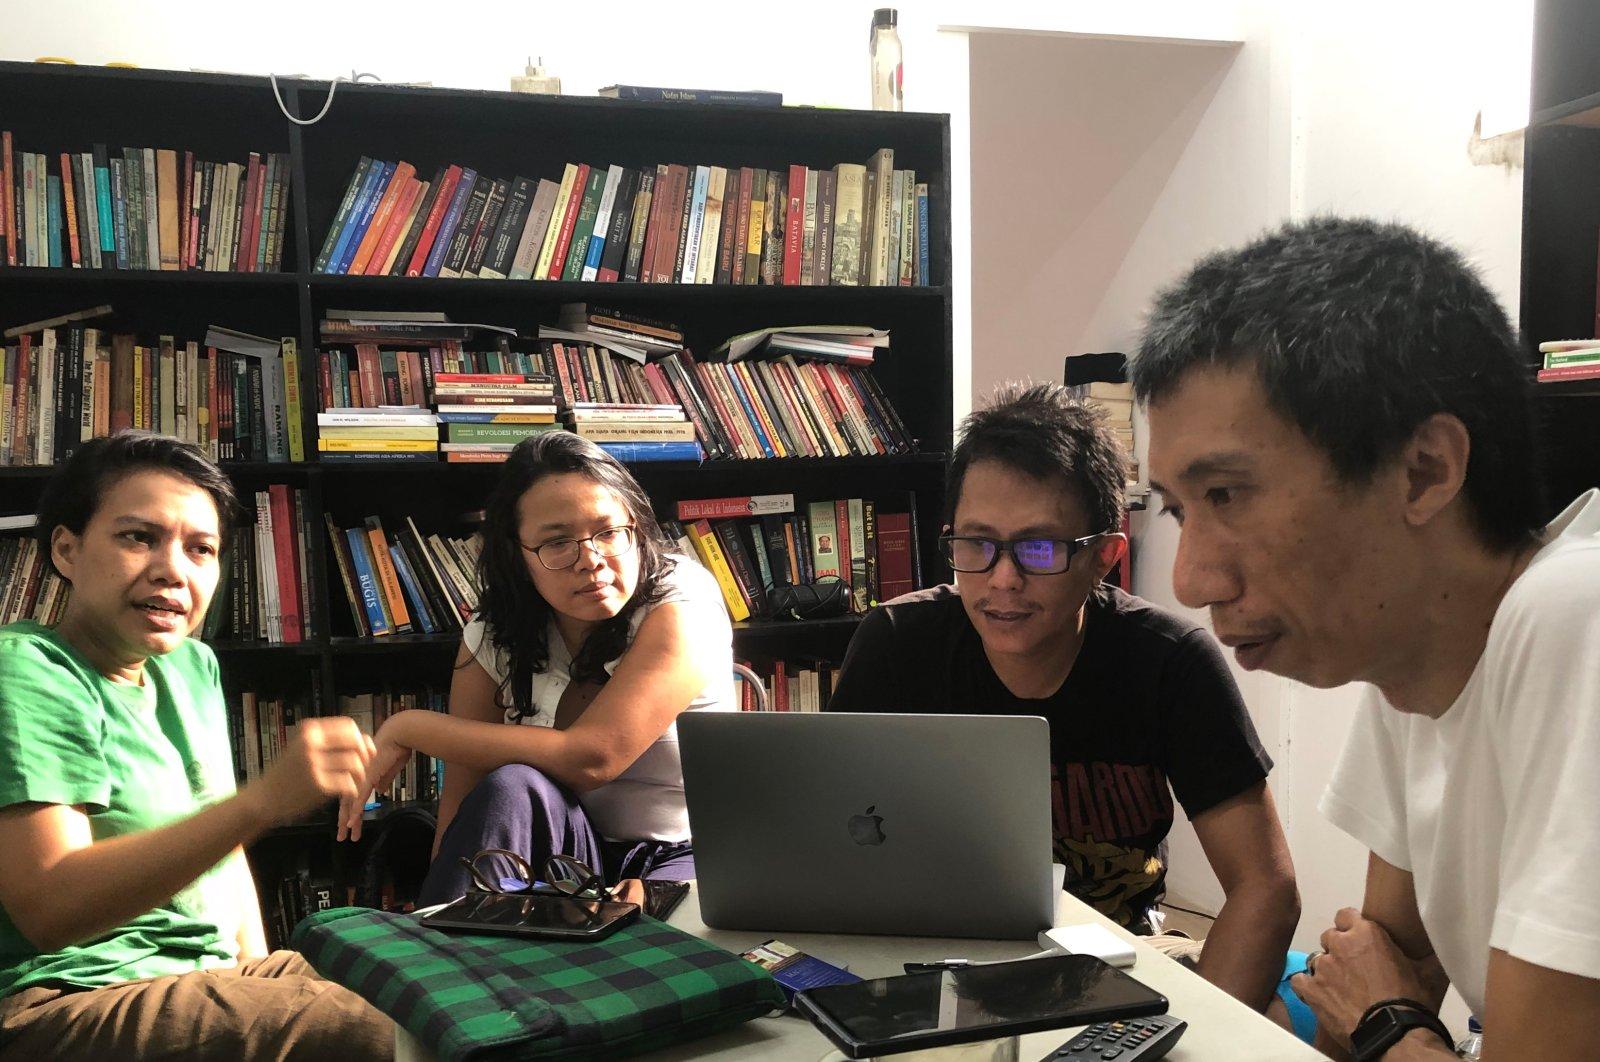 From left to right, Reza Afisina, Ajang Nurul Aini, Mirwan Andan and Iswanto Hartono from the artist collective Ruangrupa prepare the festival digitally. (DPA Photo)